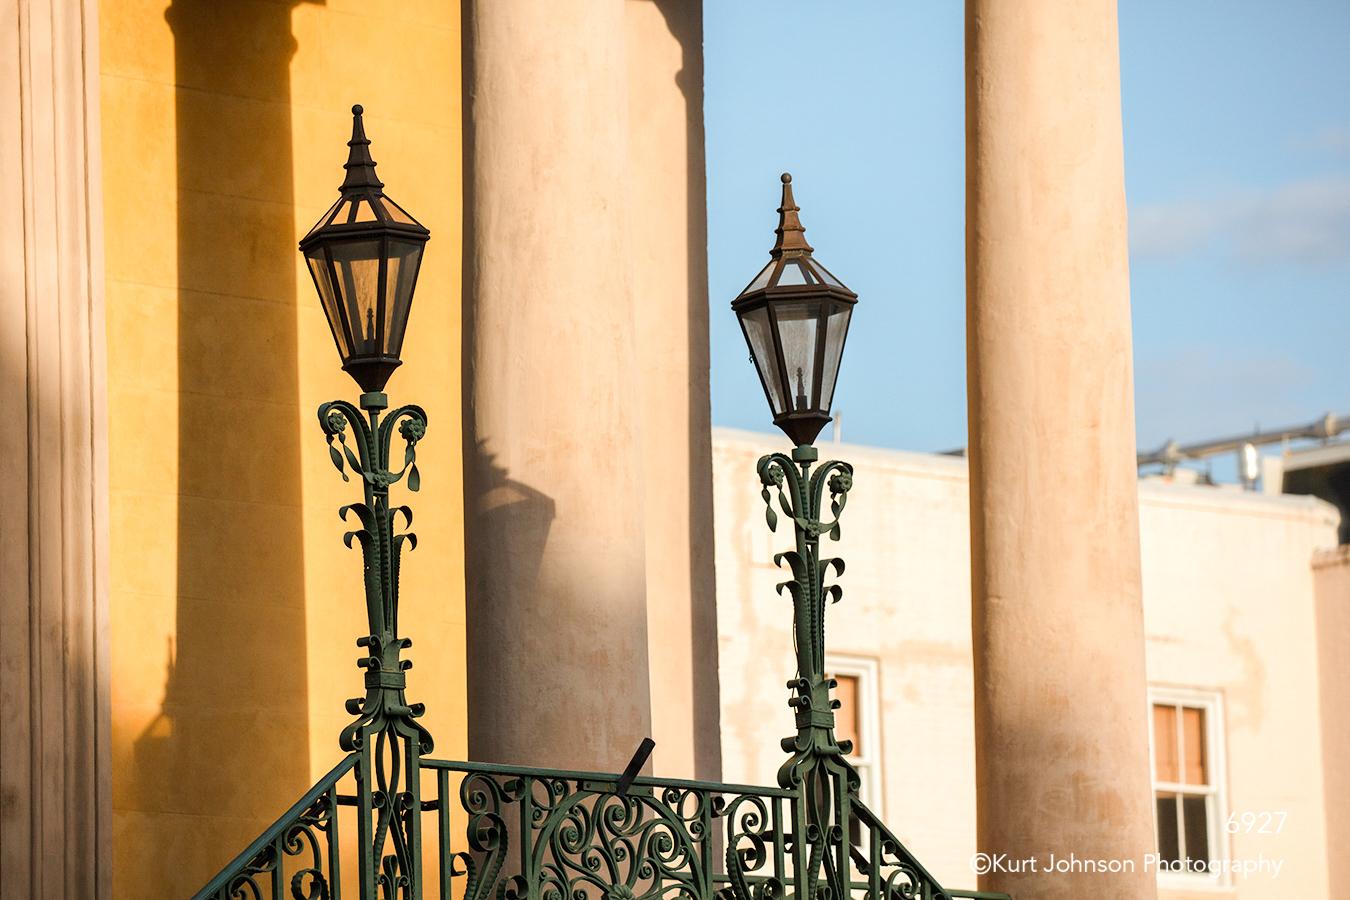 southeast Charleston South Carolina orange building blue sky architecture city lights black lamp posts